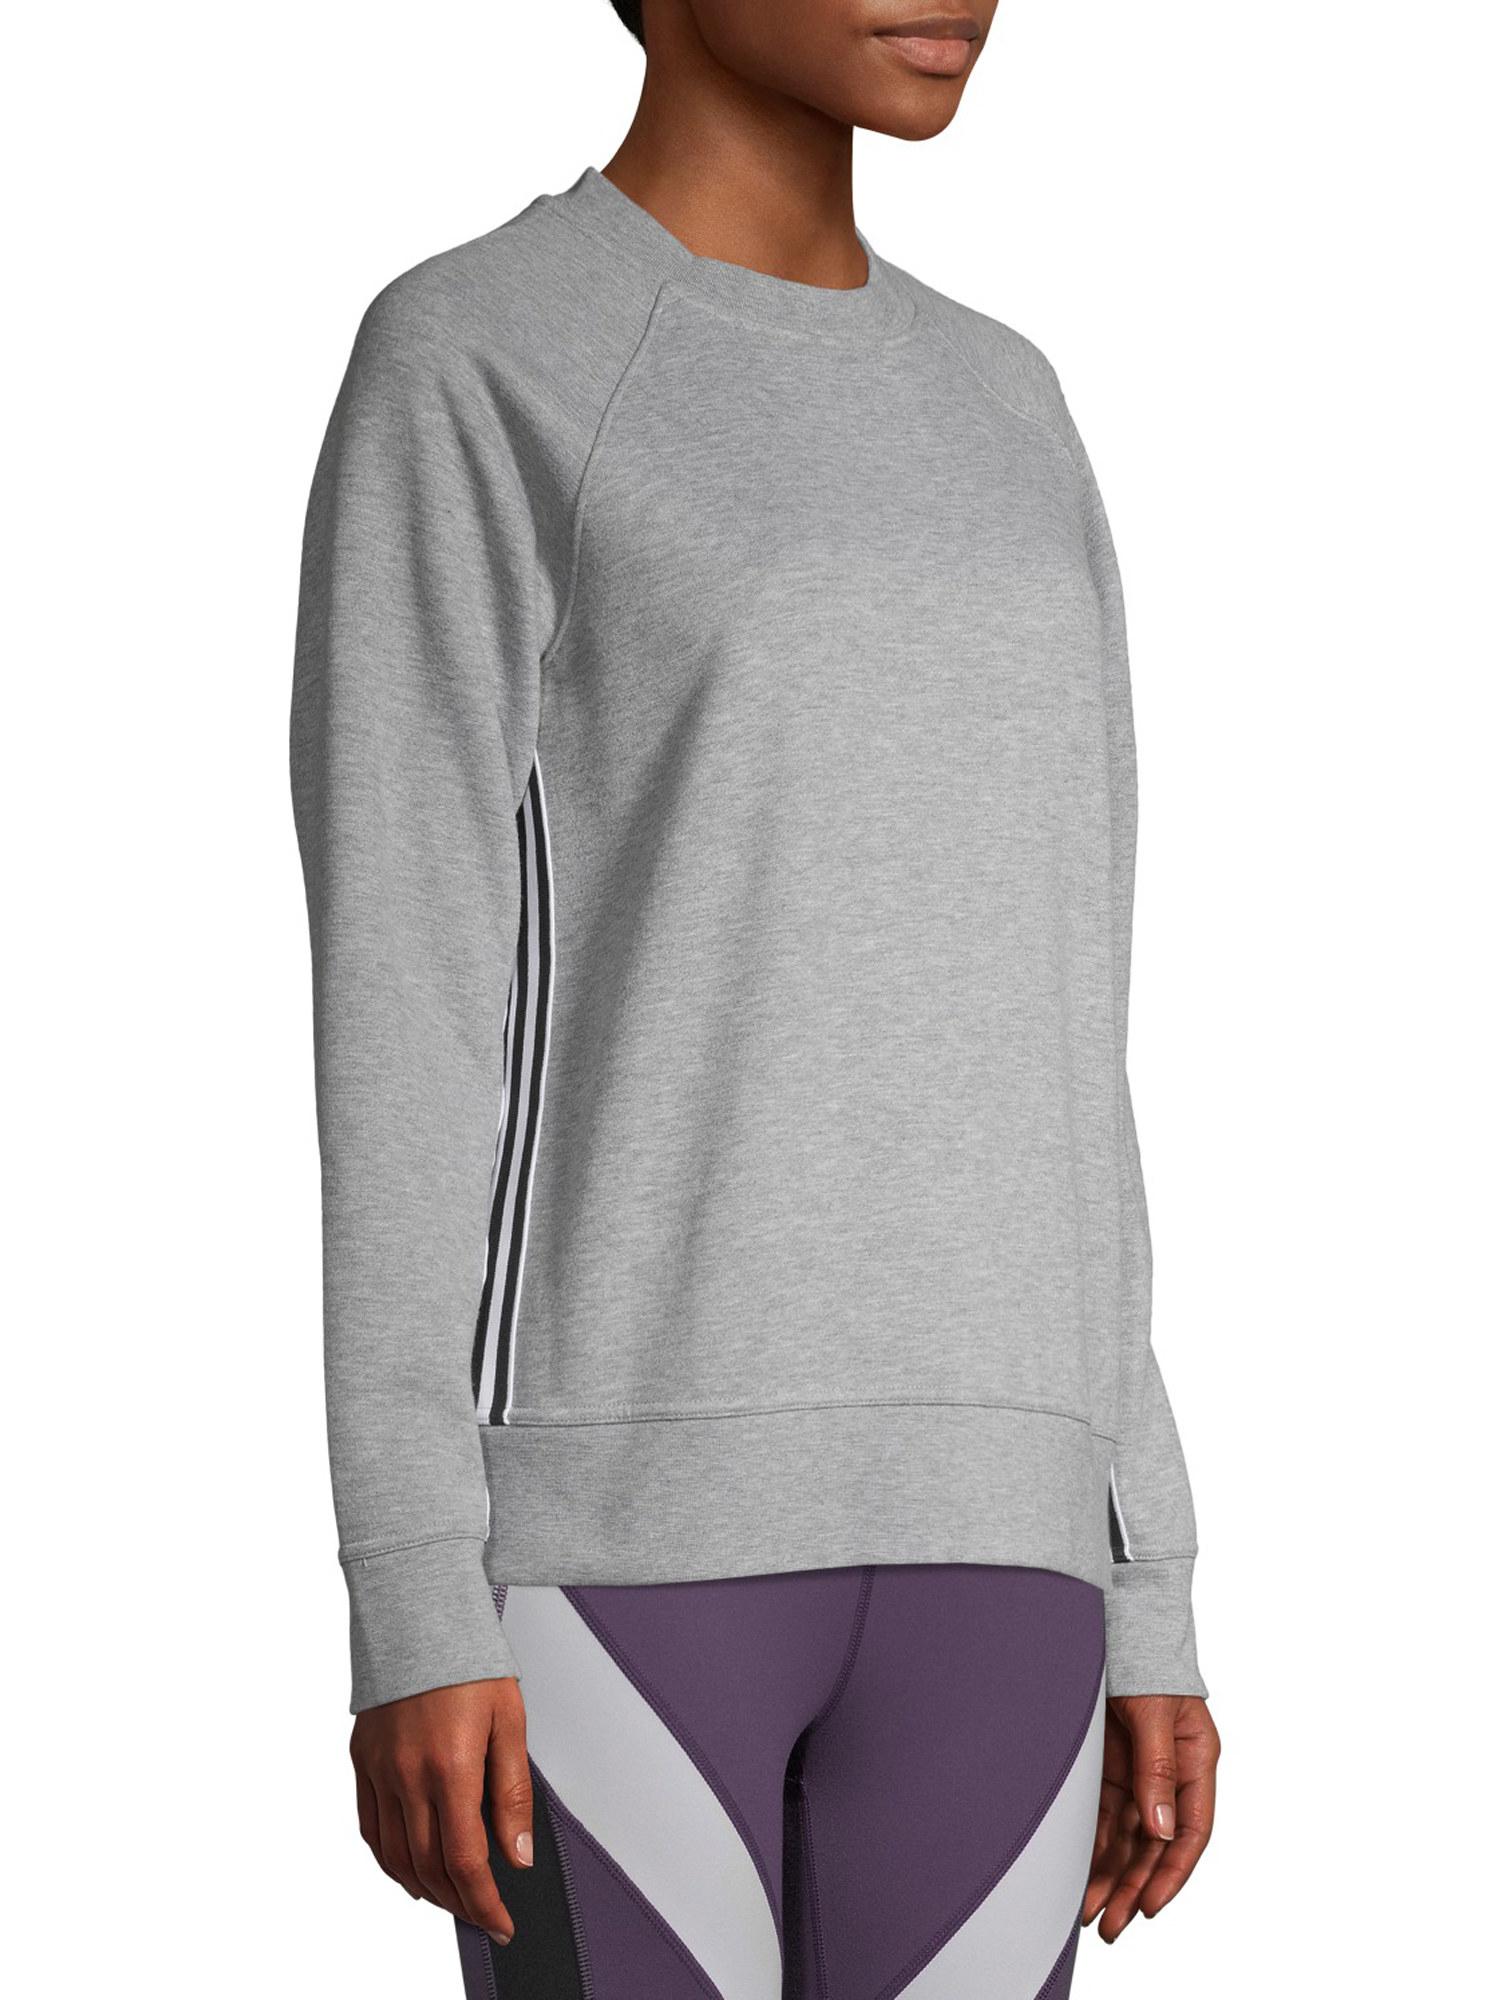 person wearing a gray crewneck sweatshirt and purple leggings